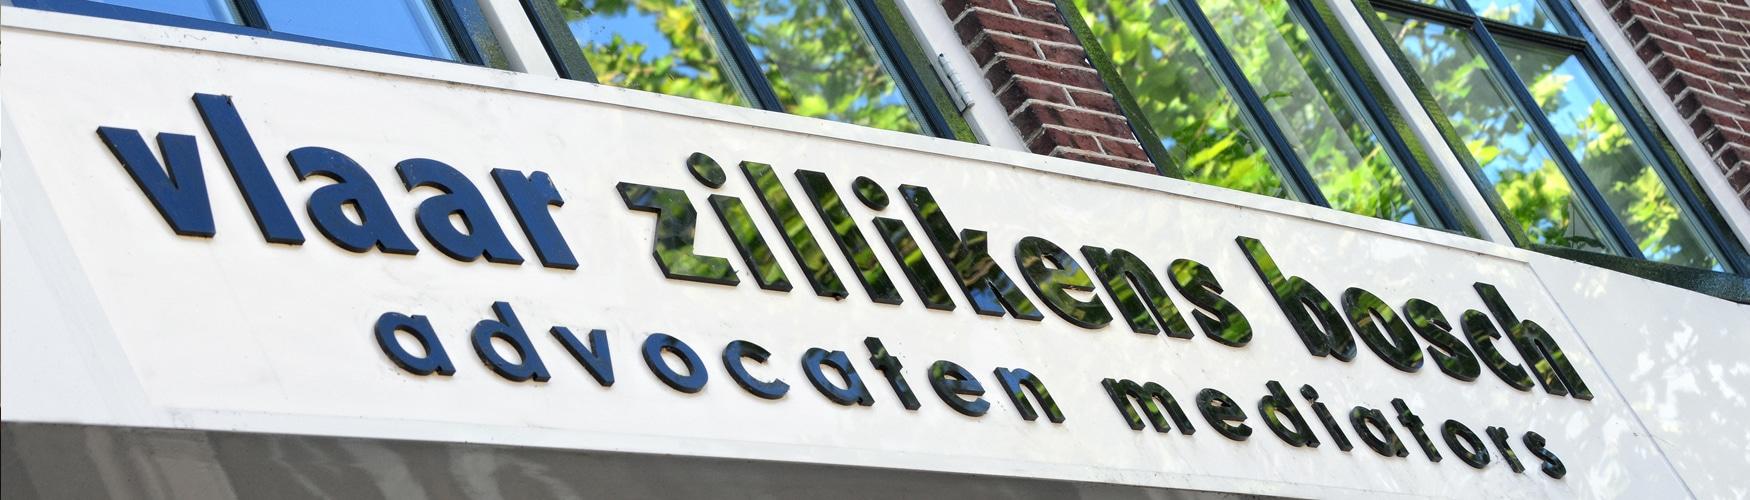 Vlaar-Zillikens-Bosch-Advocaten-Mediators-Hoorn-Volendam